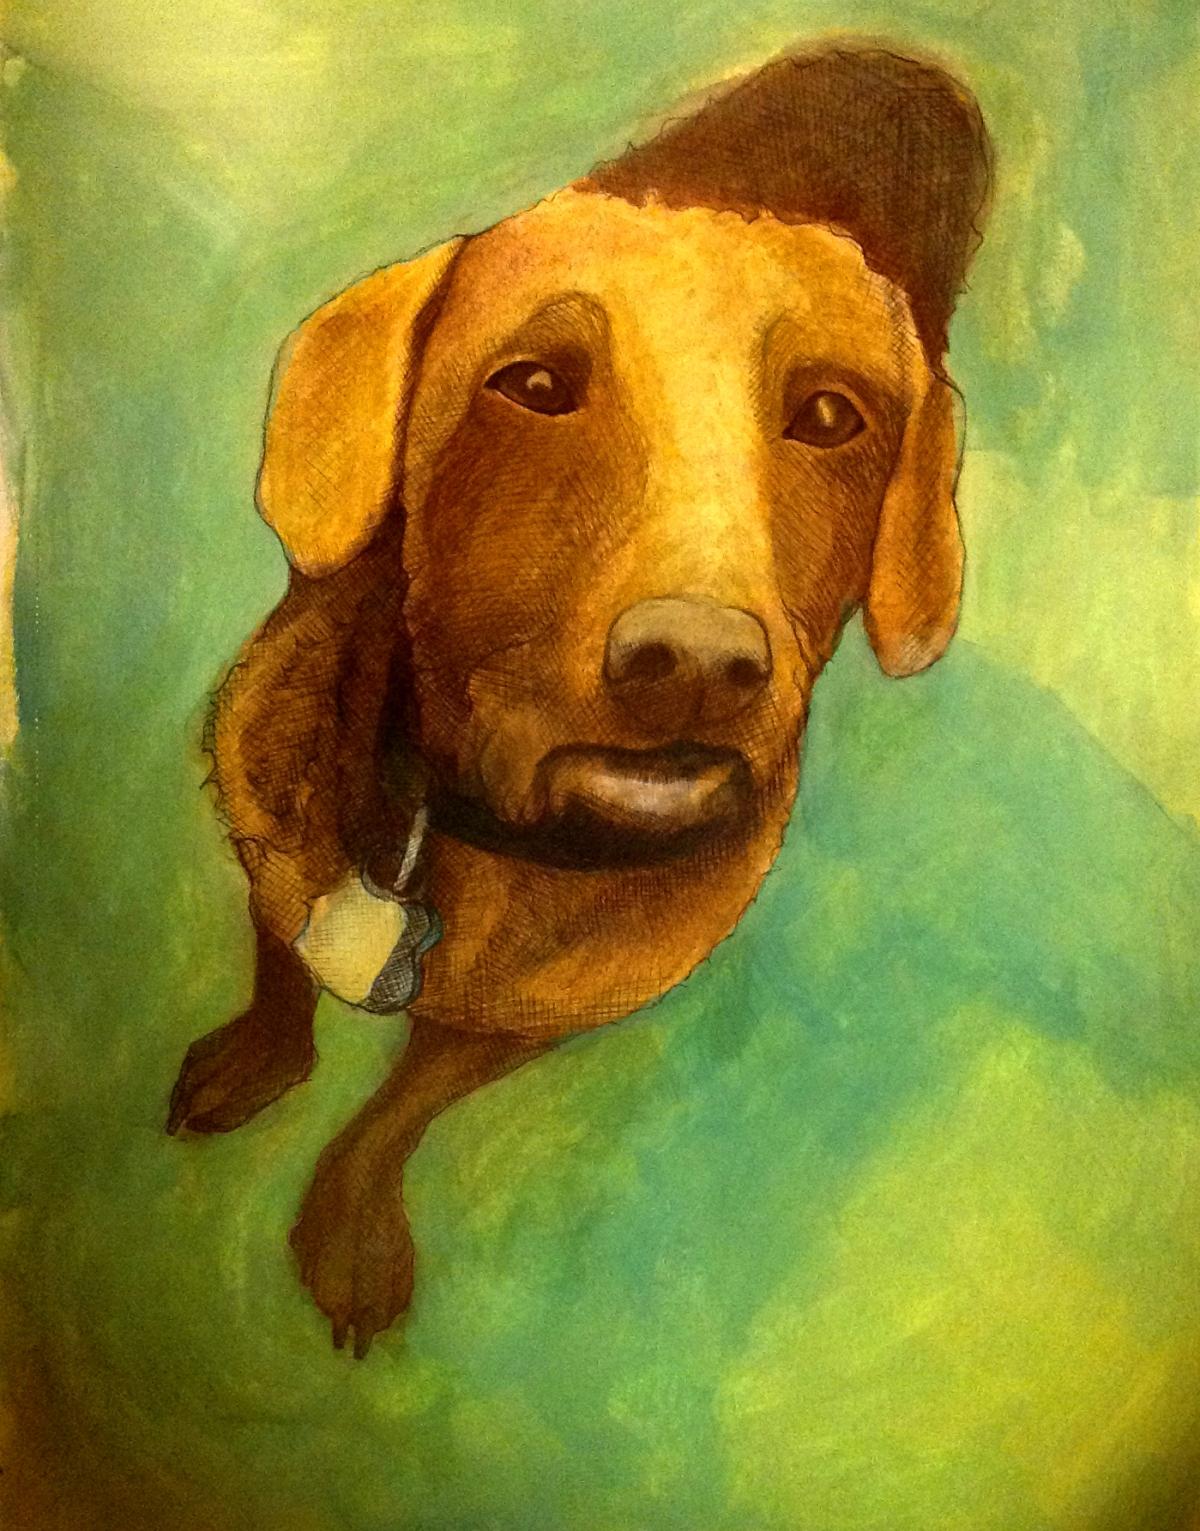 illustration of a dachshund mix